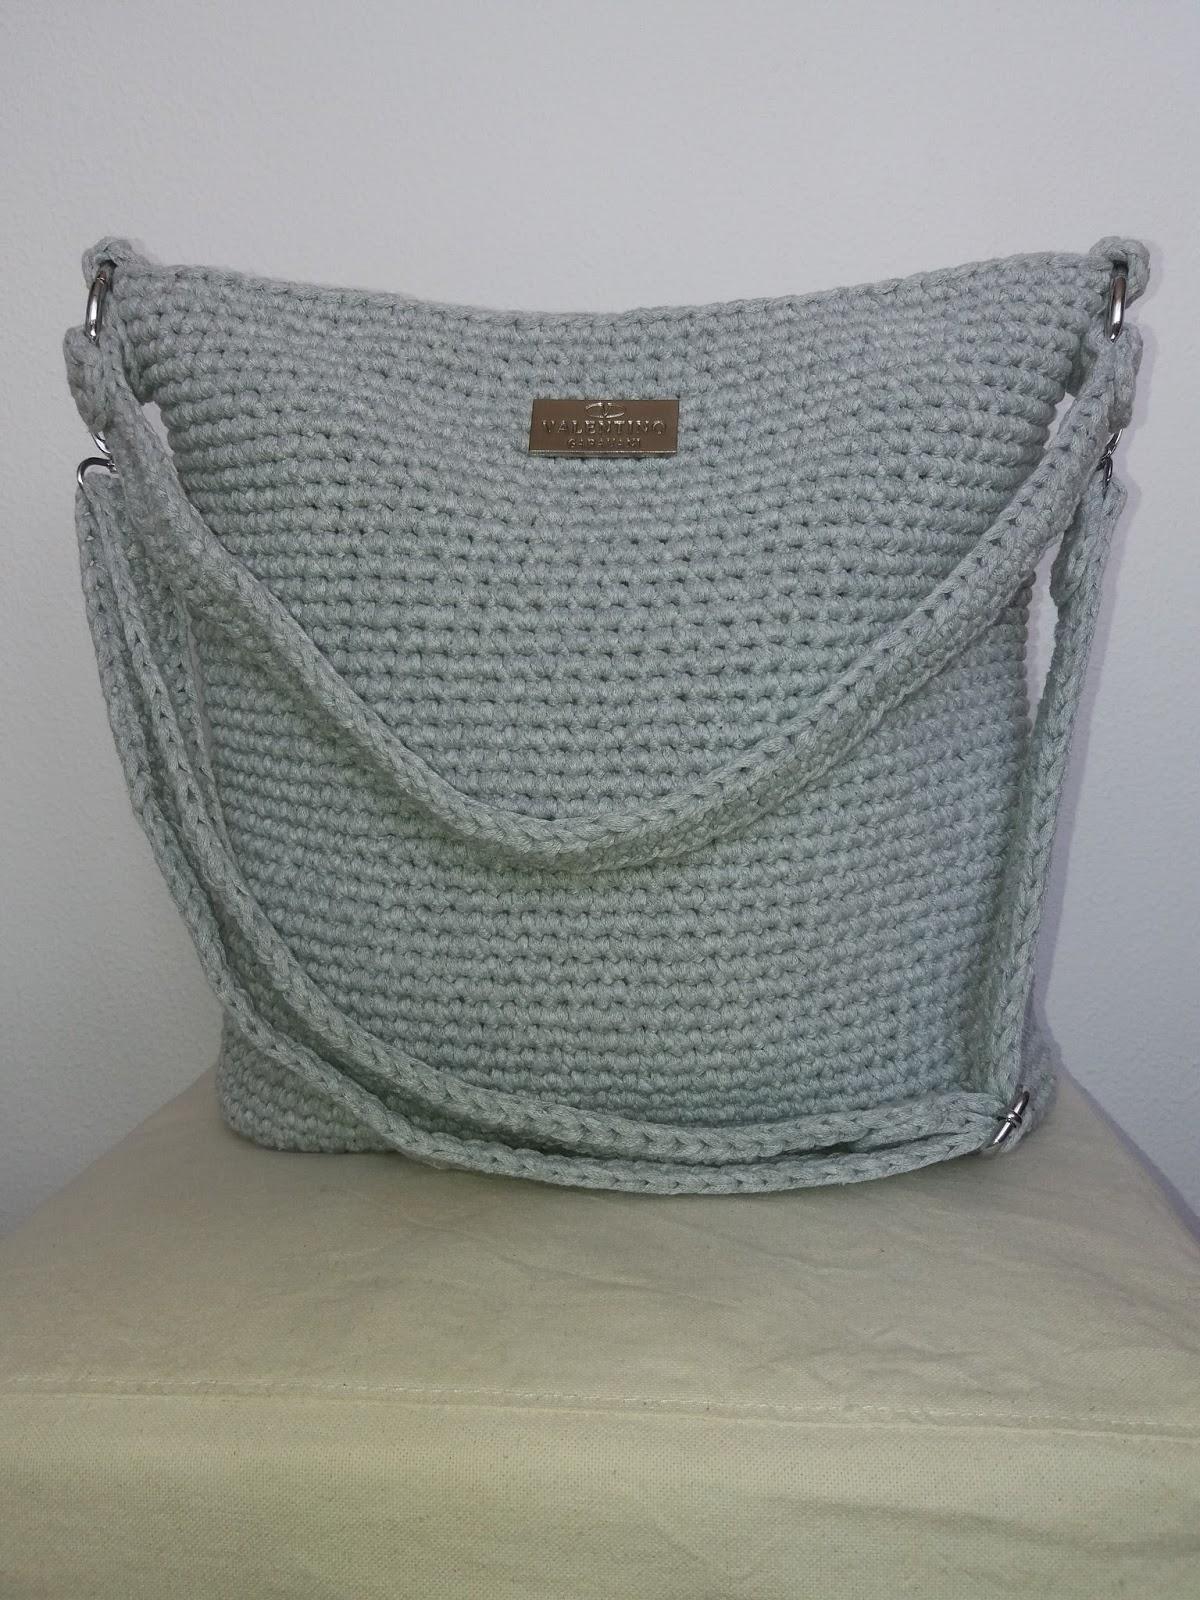 Emmhouse T Shirt Yarn Cross Body Bag Free Written Pattern